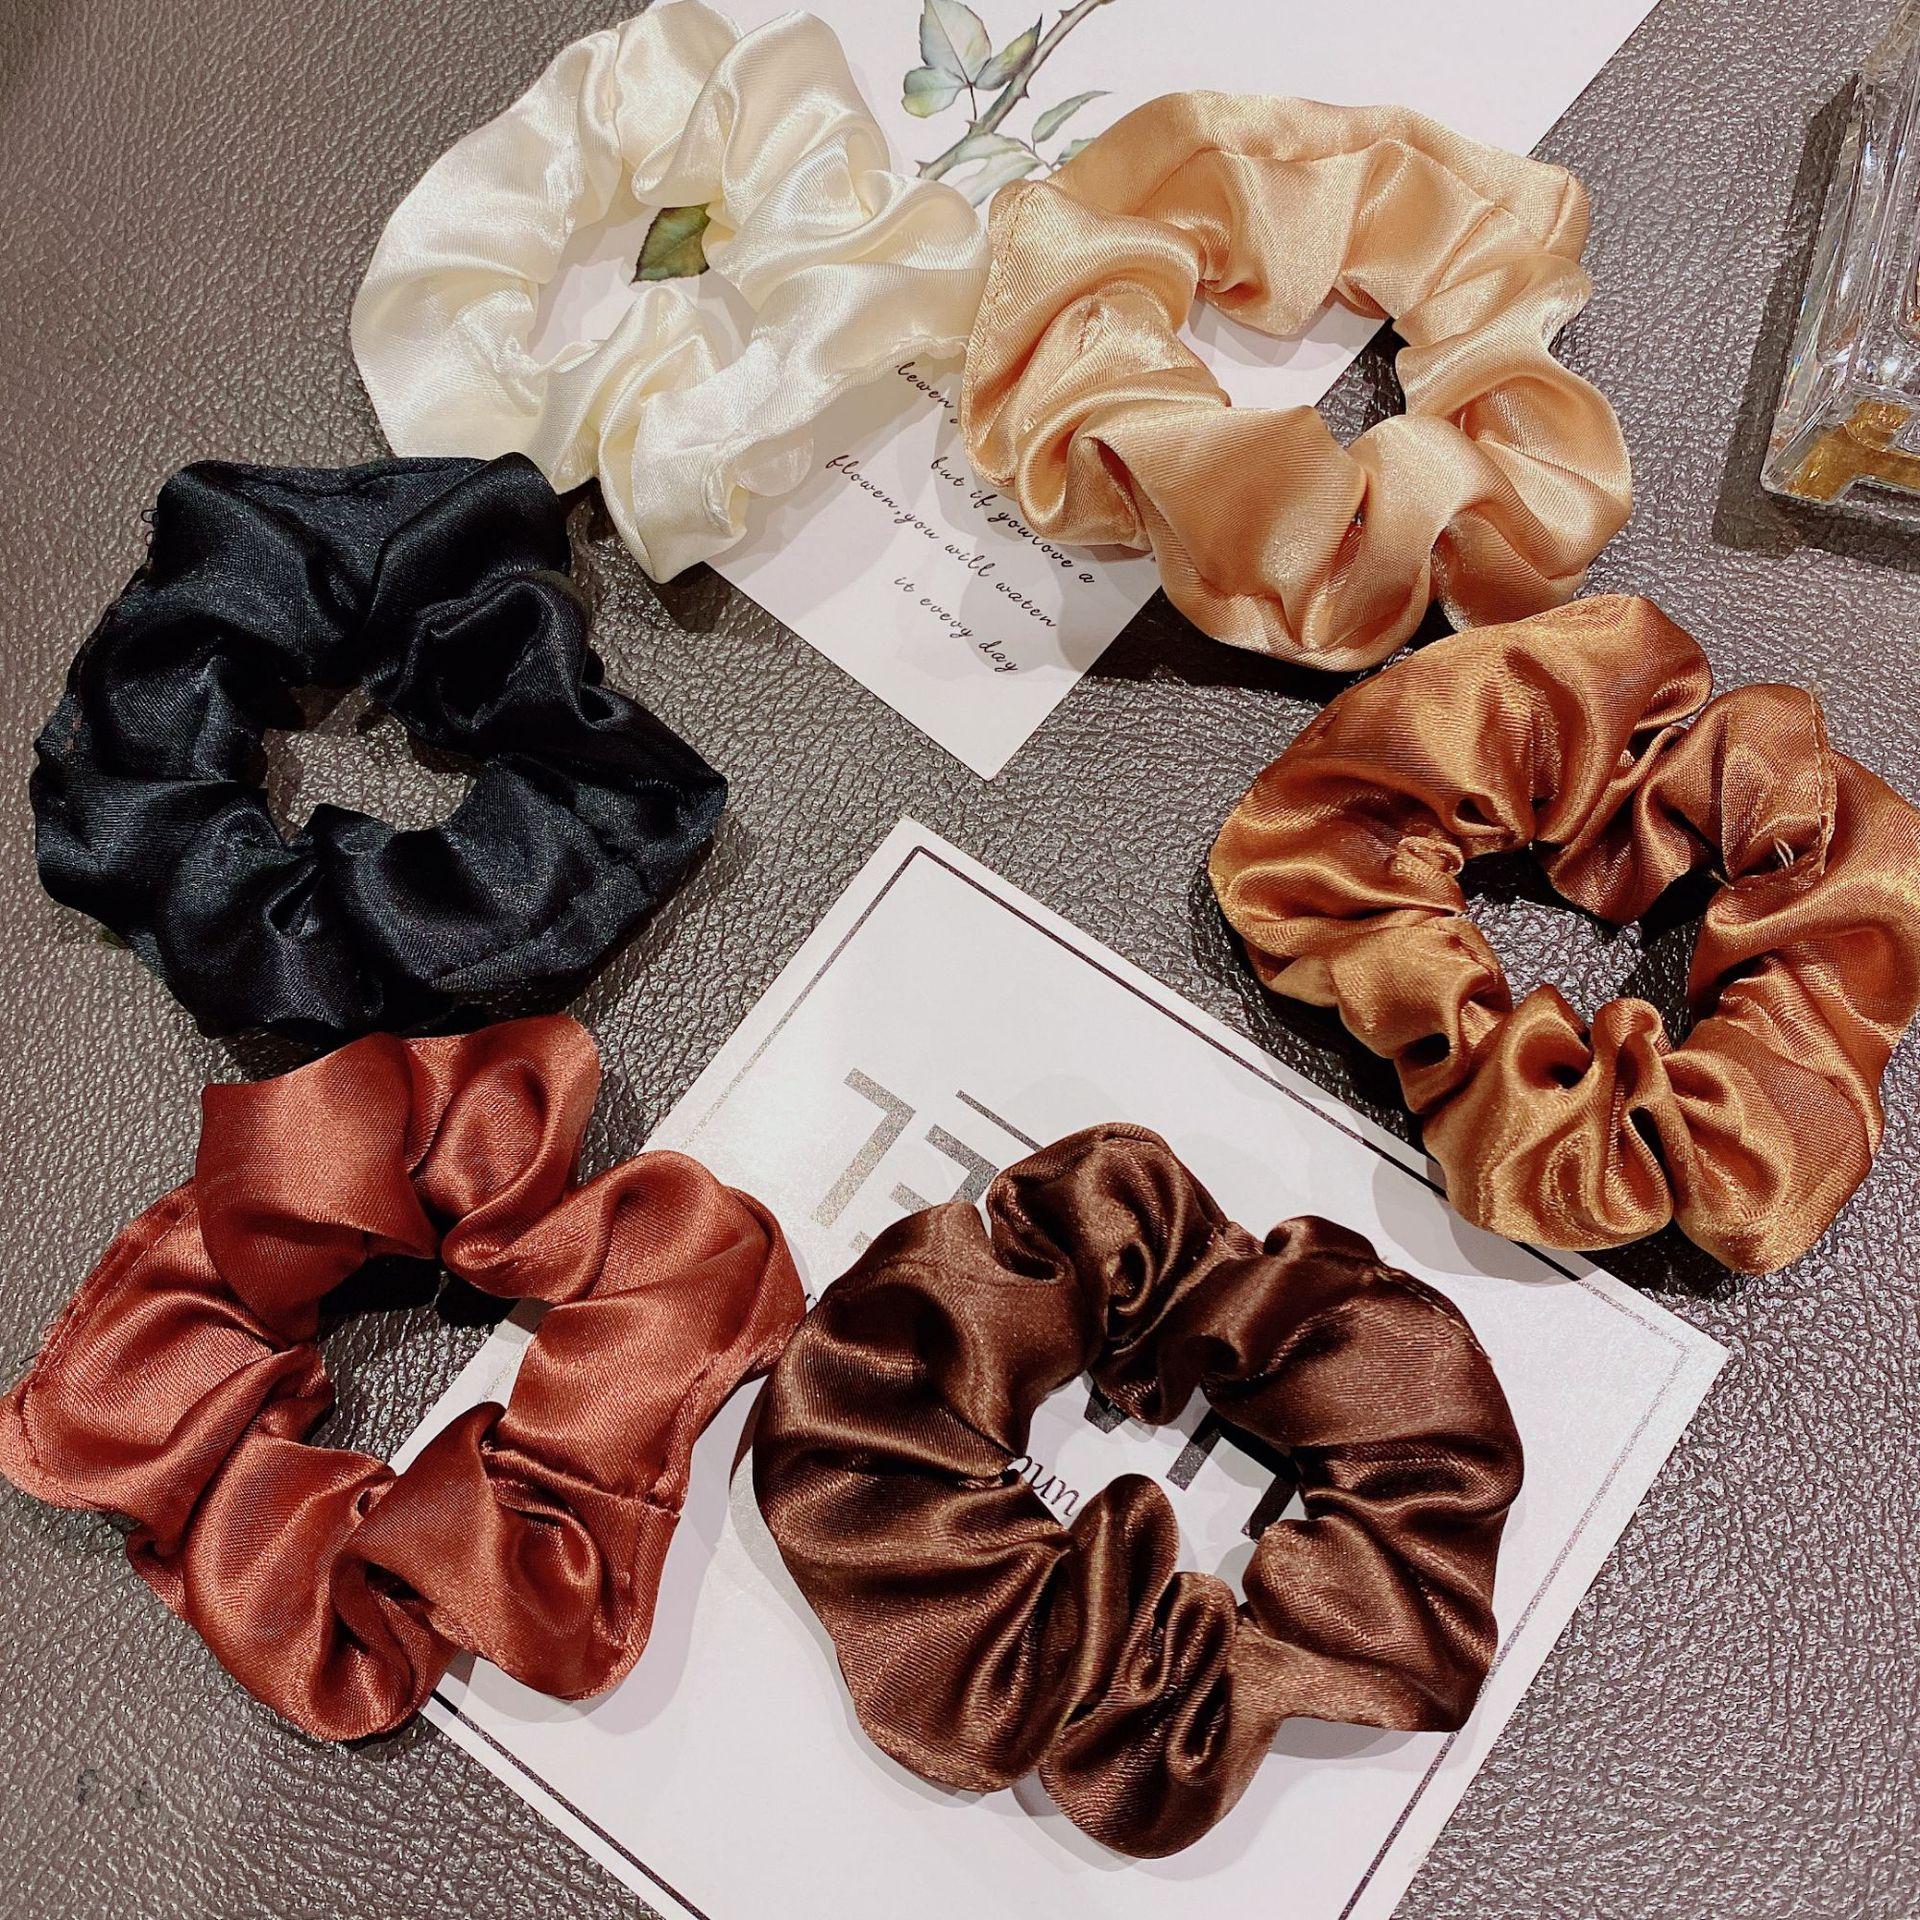 Women Silk rubber band hair bands satin Silk Multicolor Hair Band Ponytail Holder Headband Hair Accessories Satin Silk Solid